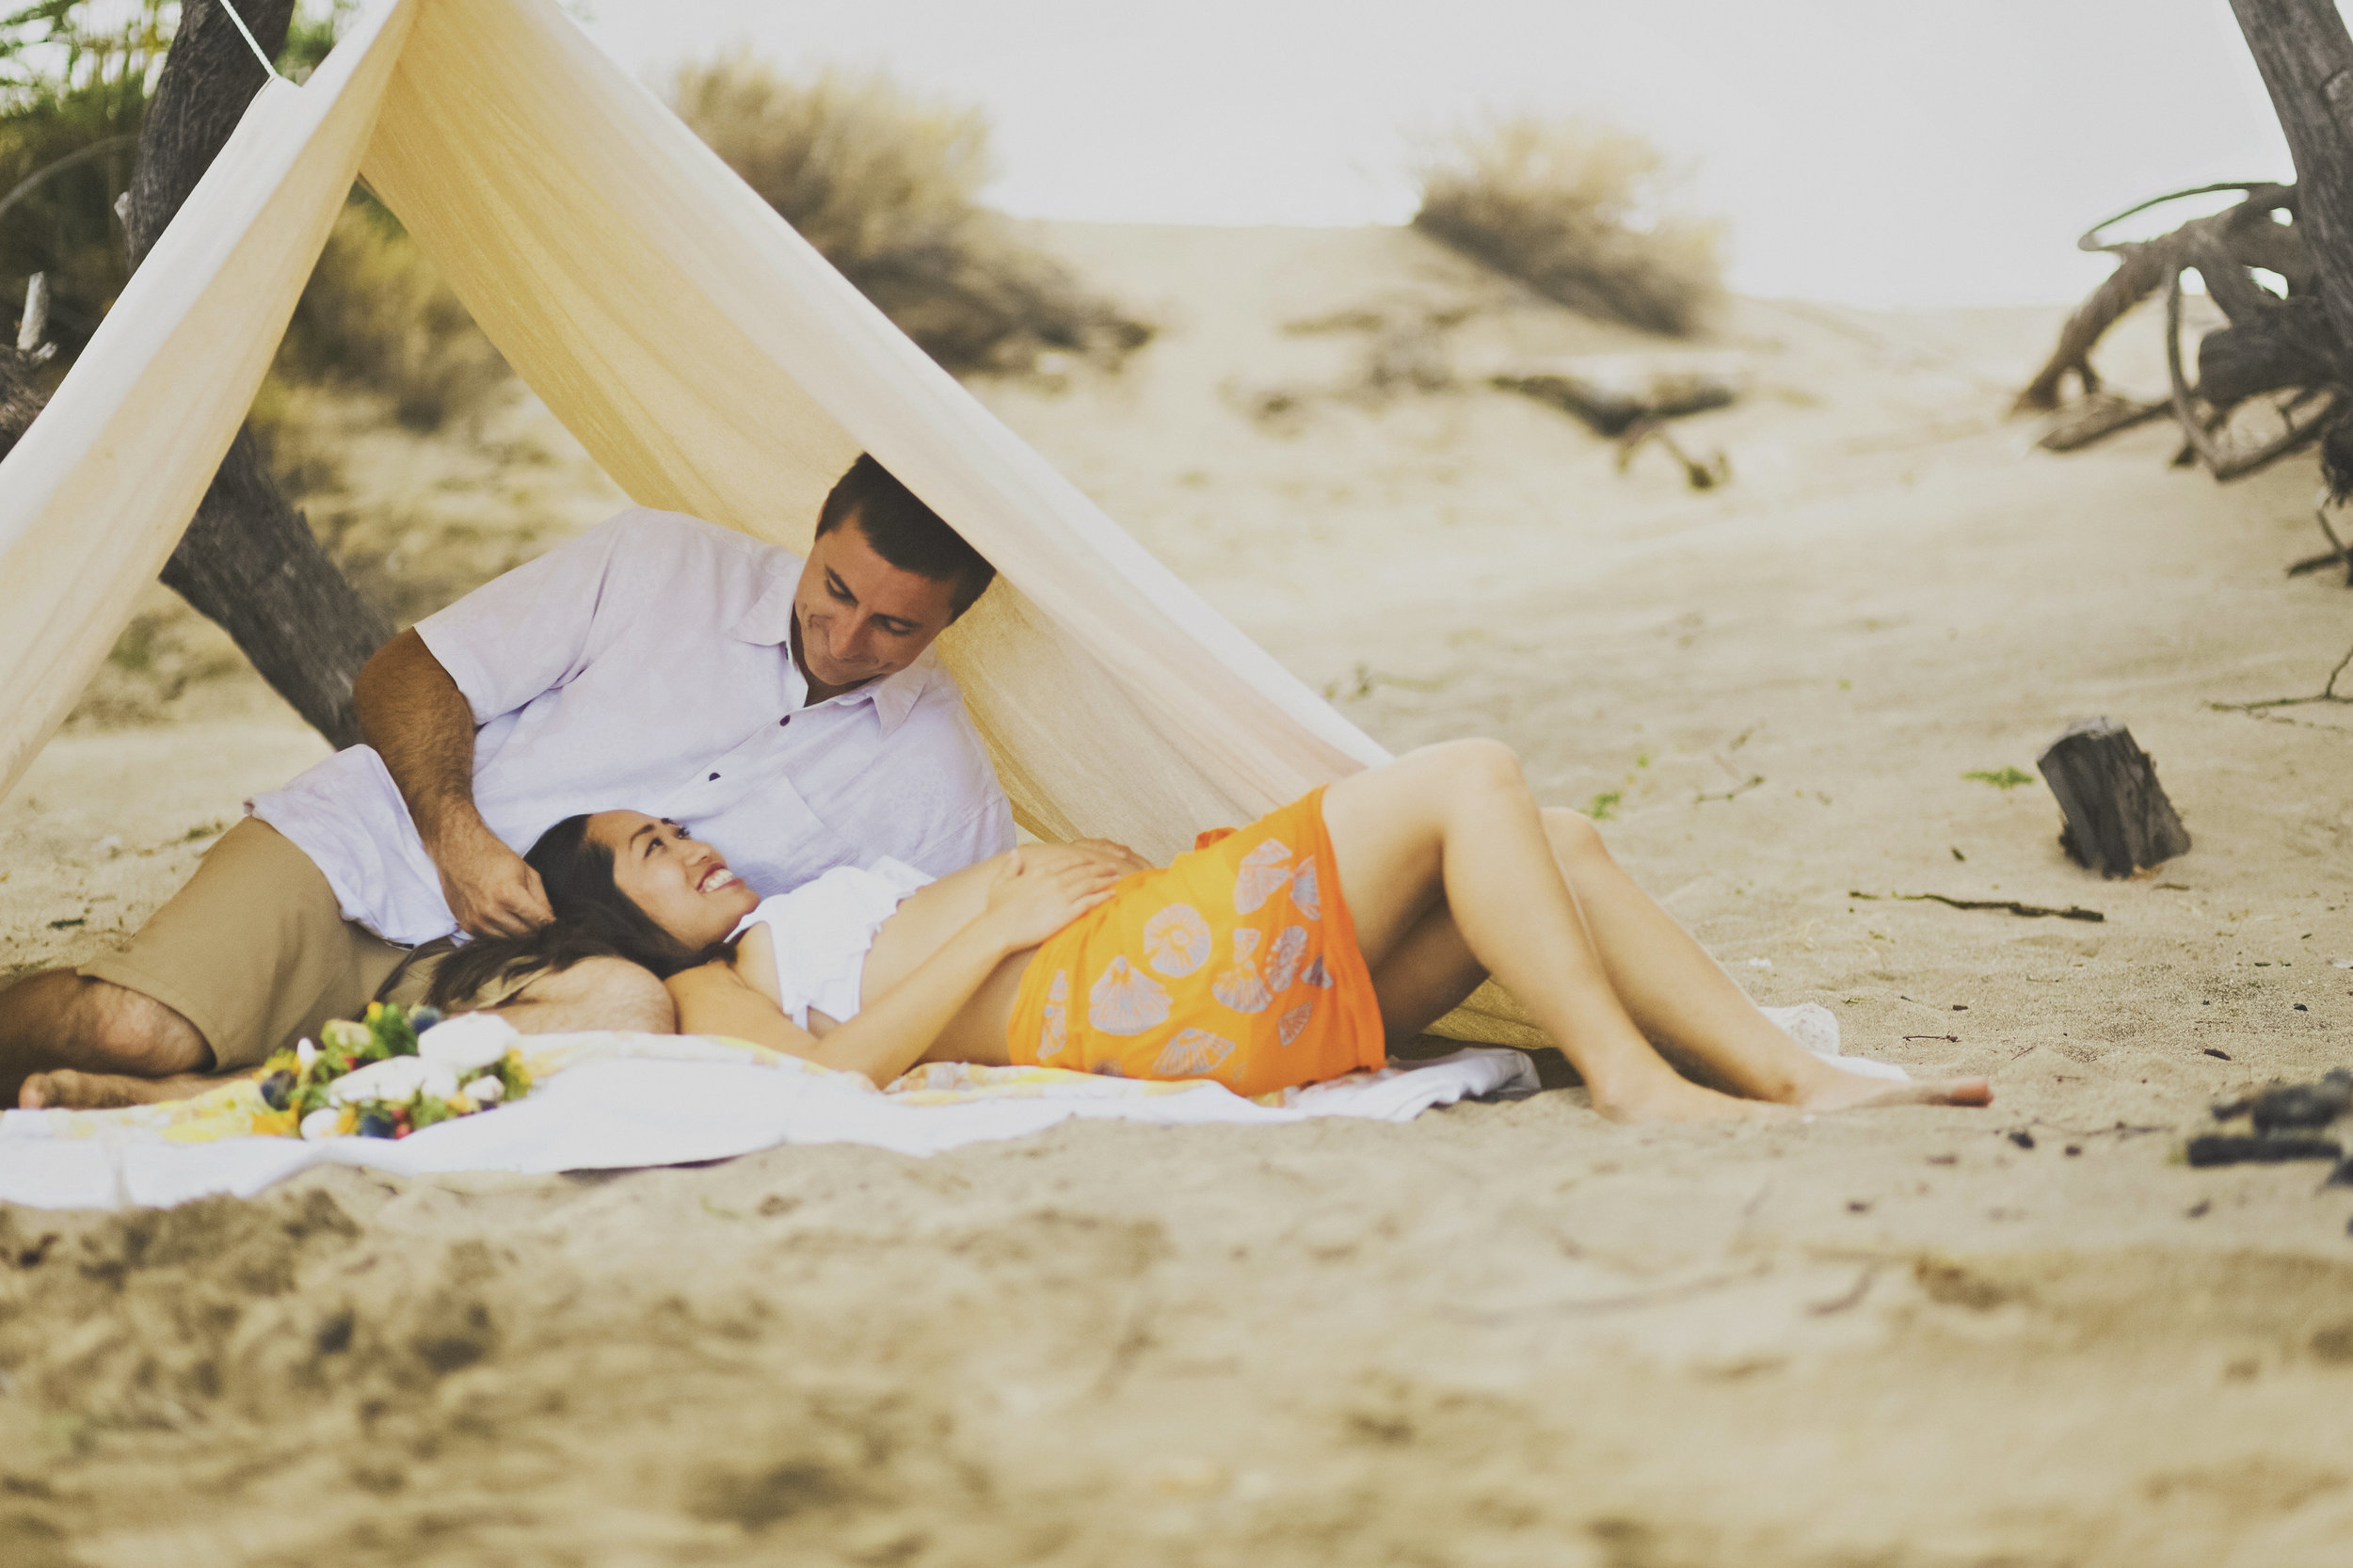 angie-diaz-photography-maui-maternity-lahaina-baby-beach-06.jpg